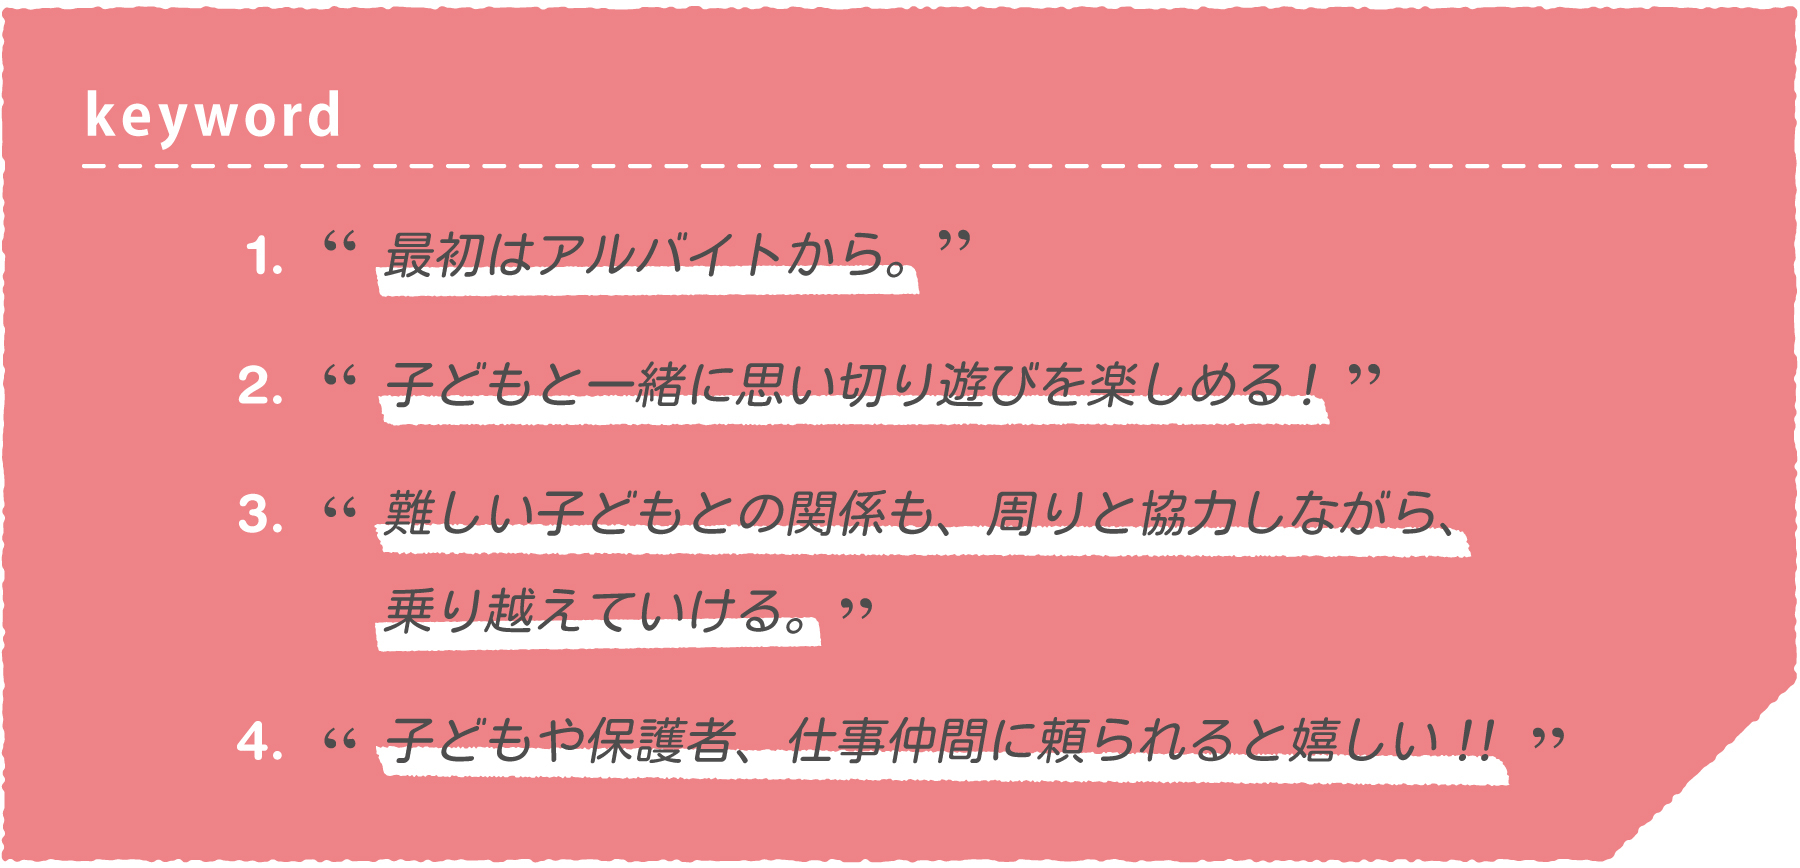 2019chigasaki_interview_02.jpg